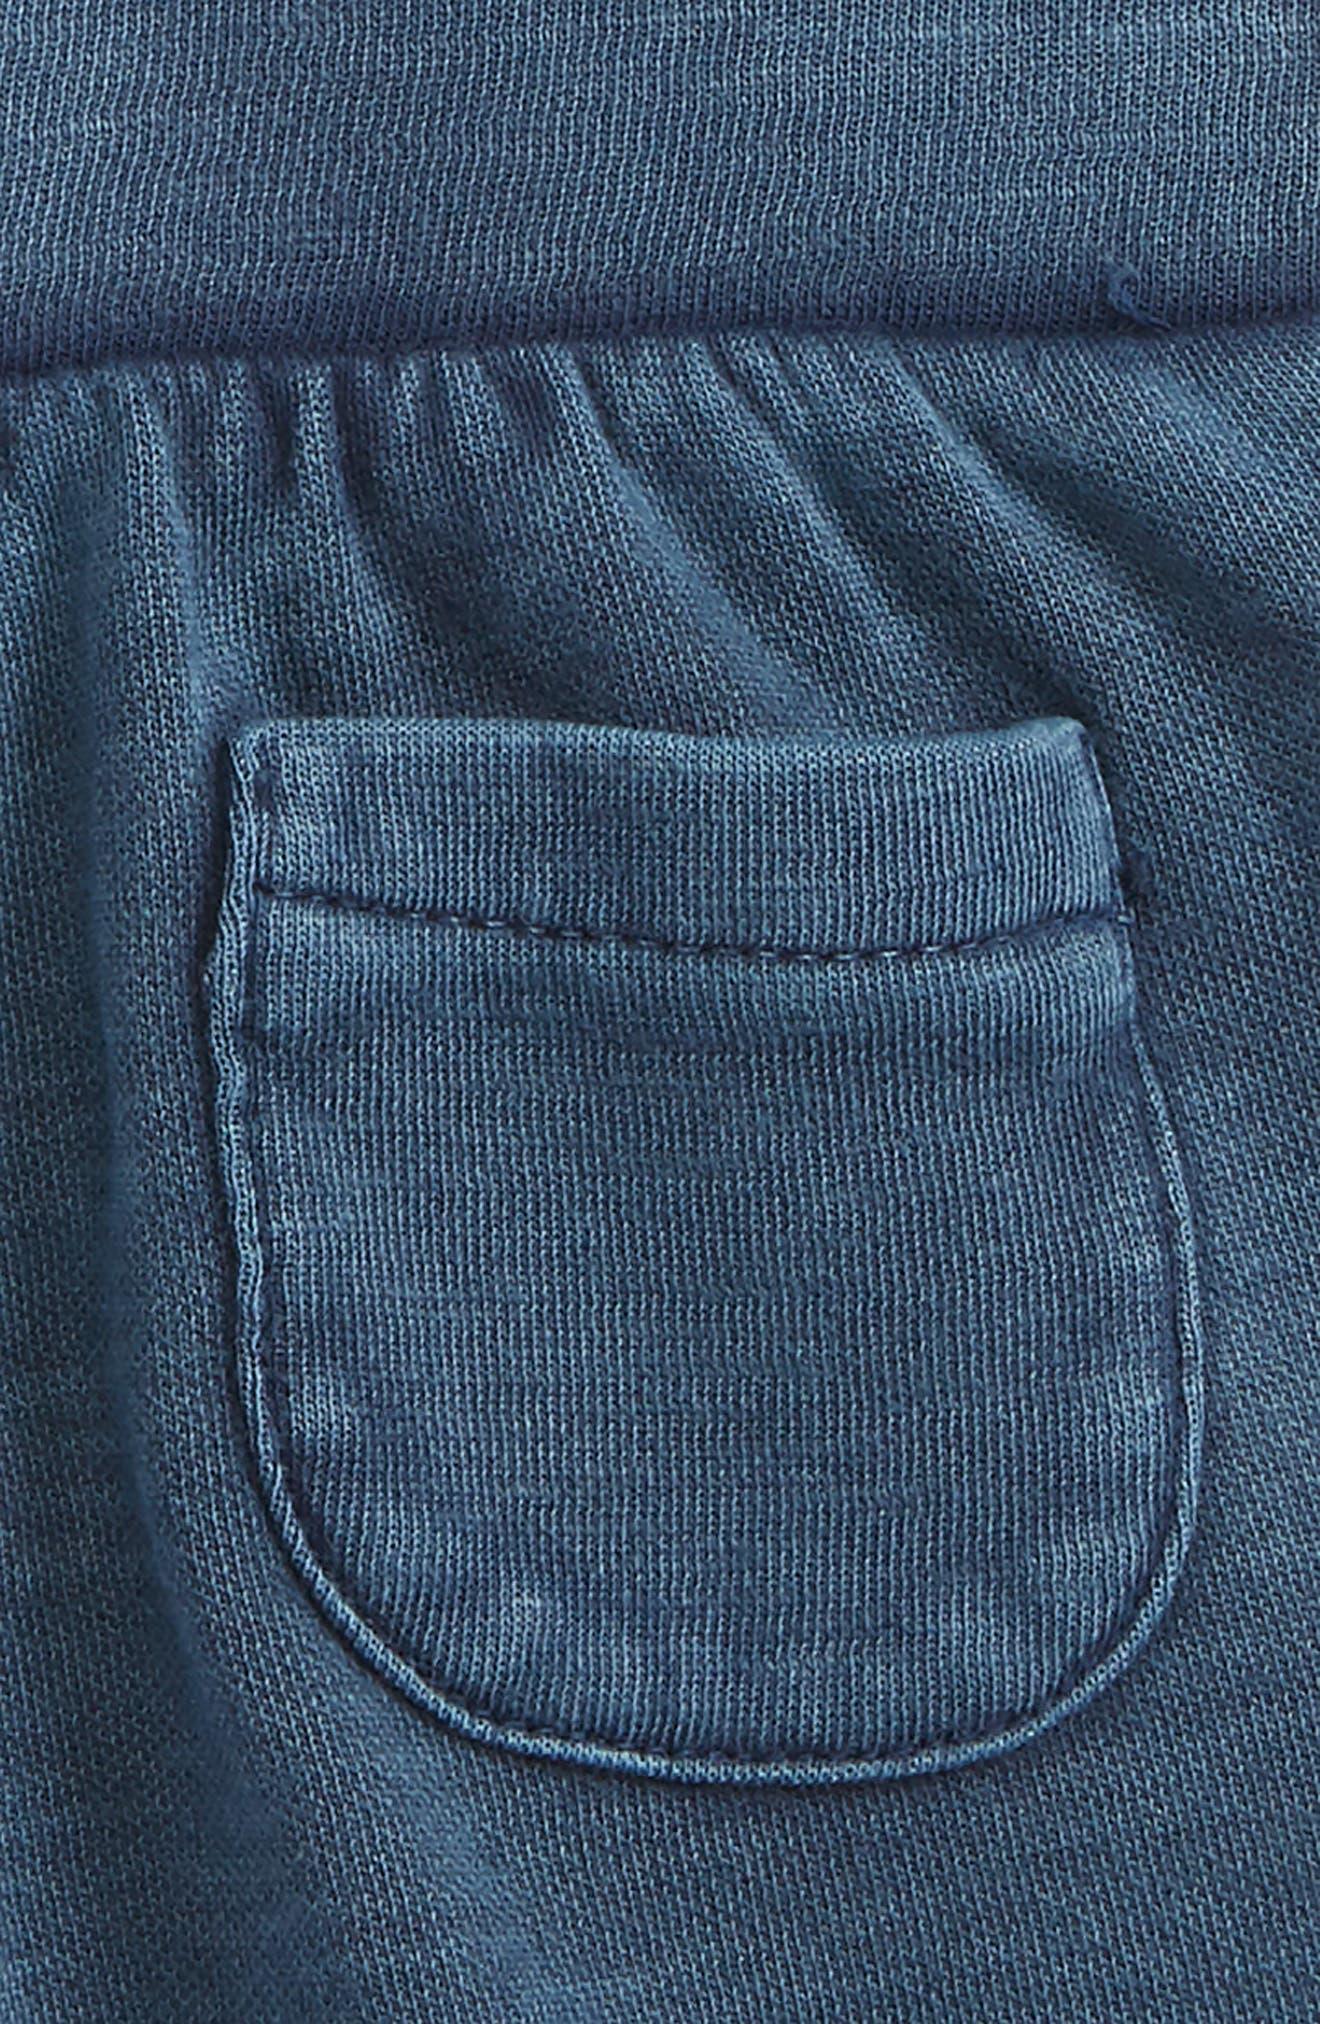 Alternate Image 3  - Tucker + Tate Knit Shorts (Baby Boys)